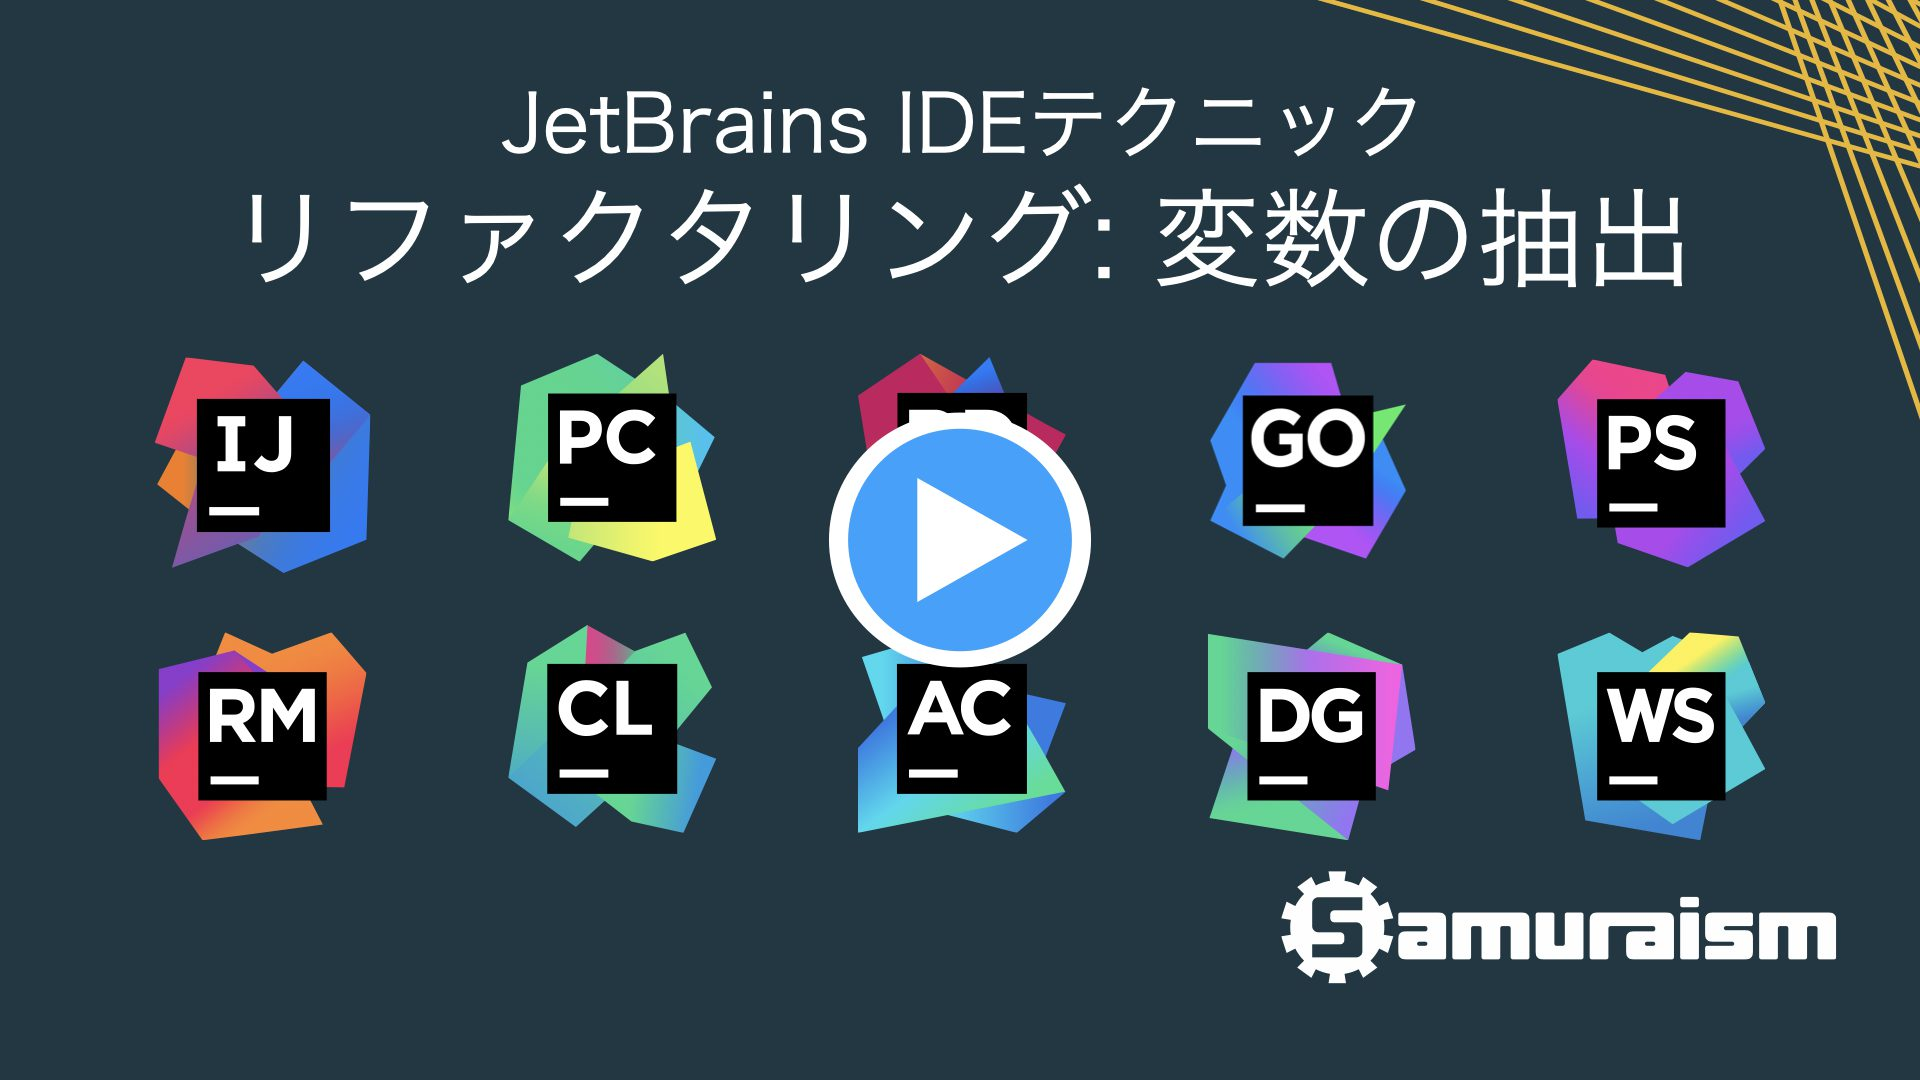 #JetBrainsIDEテクニック – 変数の抽出